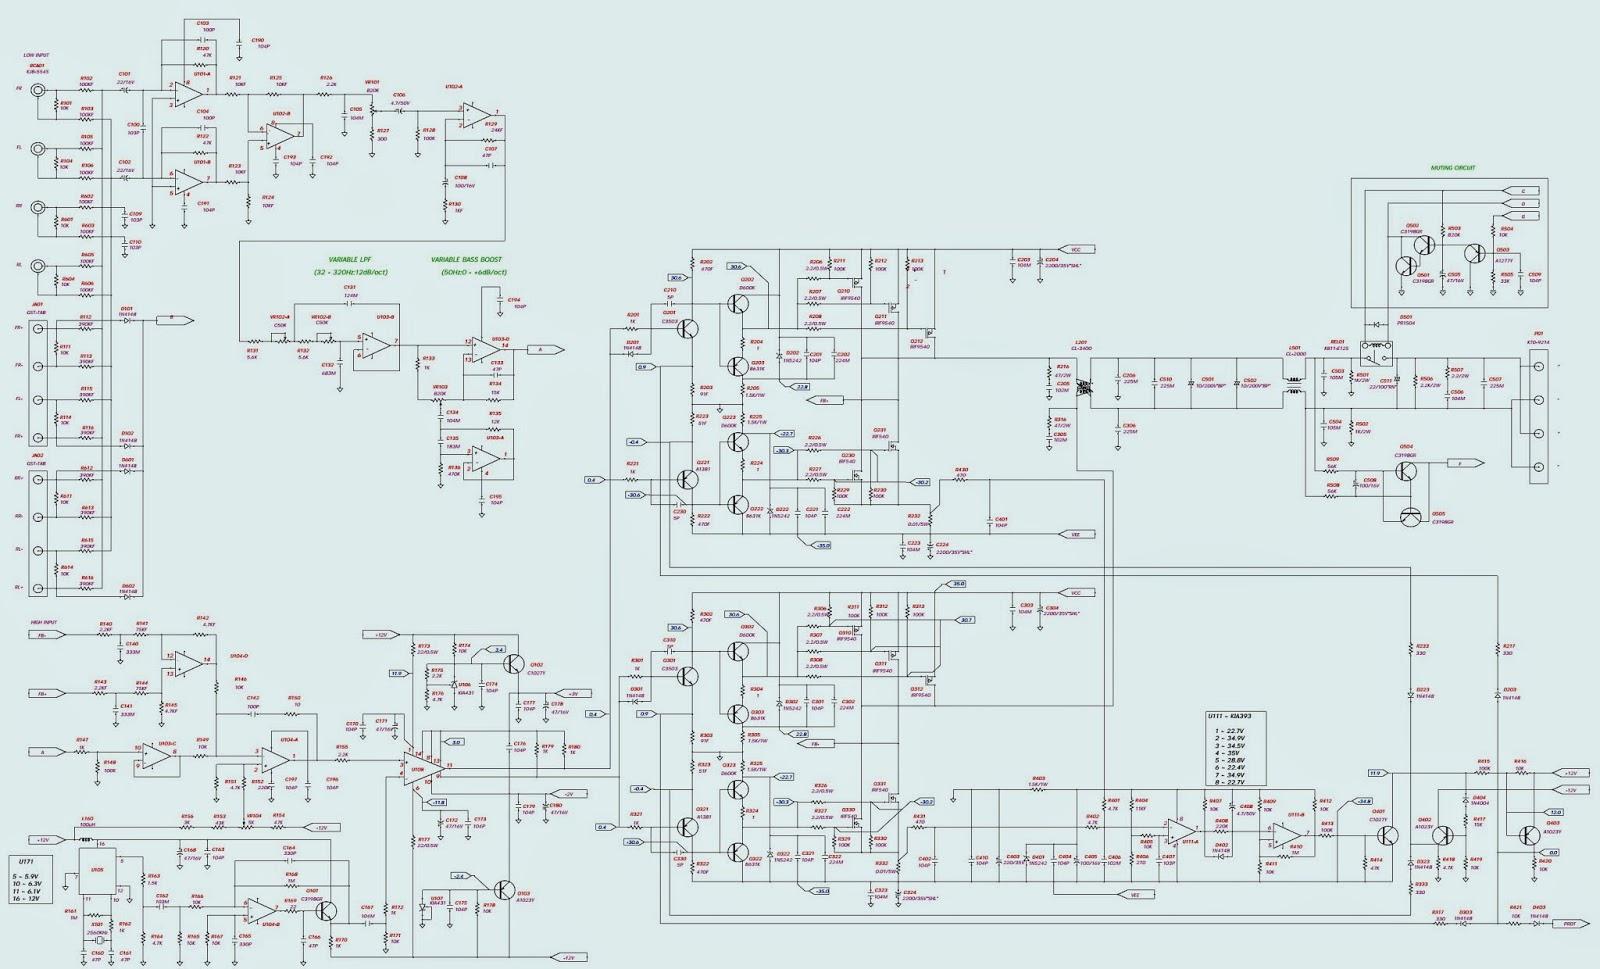 medium resolution of jbl wiring diagram wiring diagram schematics jbl 26ct wiring diagram